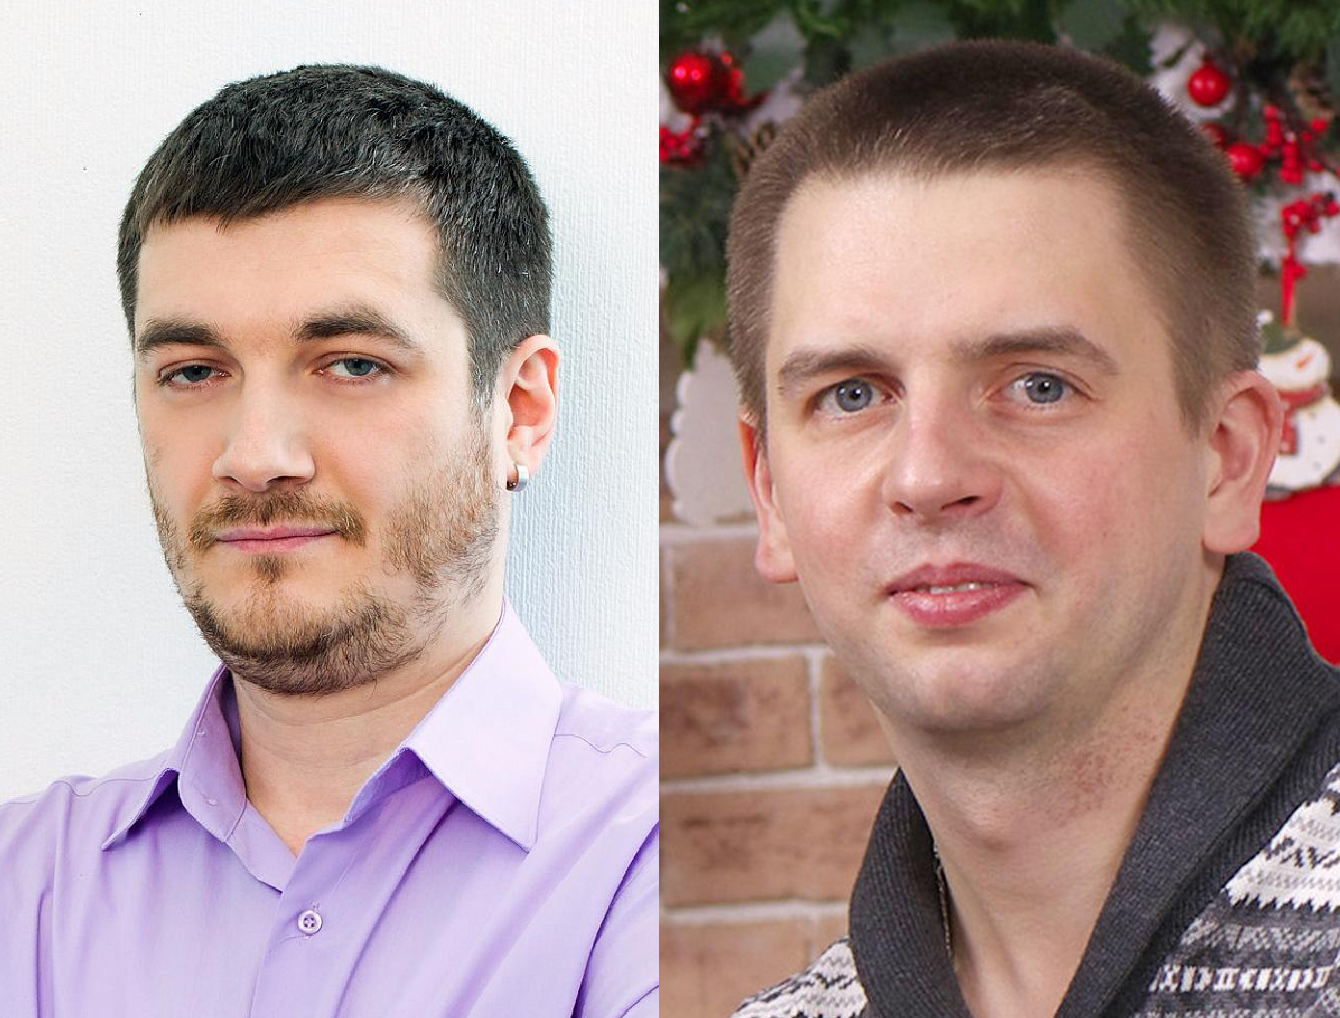 Александр Сербул, 1С-Битрикс, и Антон Тузлуков, QSOFT